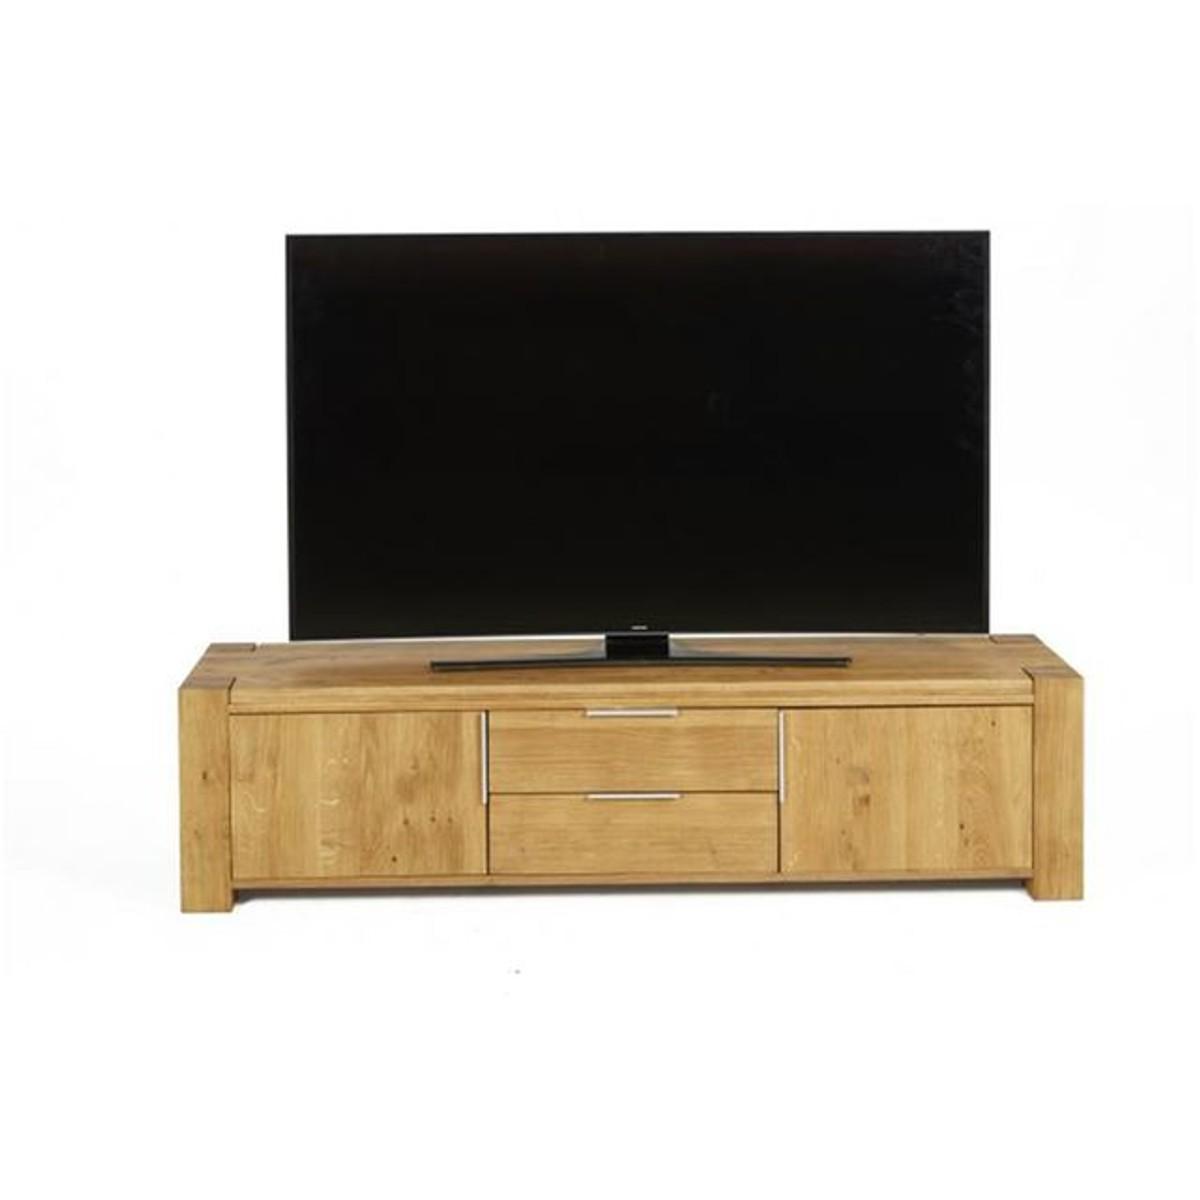 Meuble Tv Bois 2 Portes 2 Tiroirs Norna Products Meuble Tv